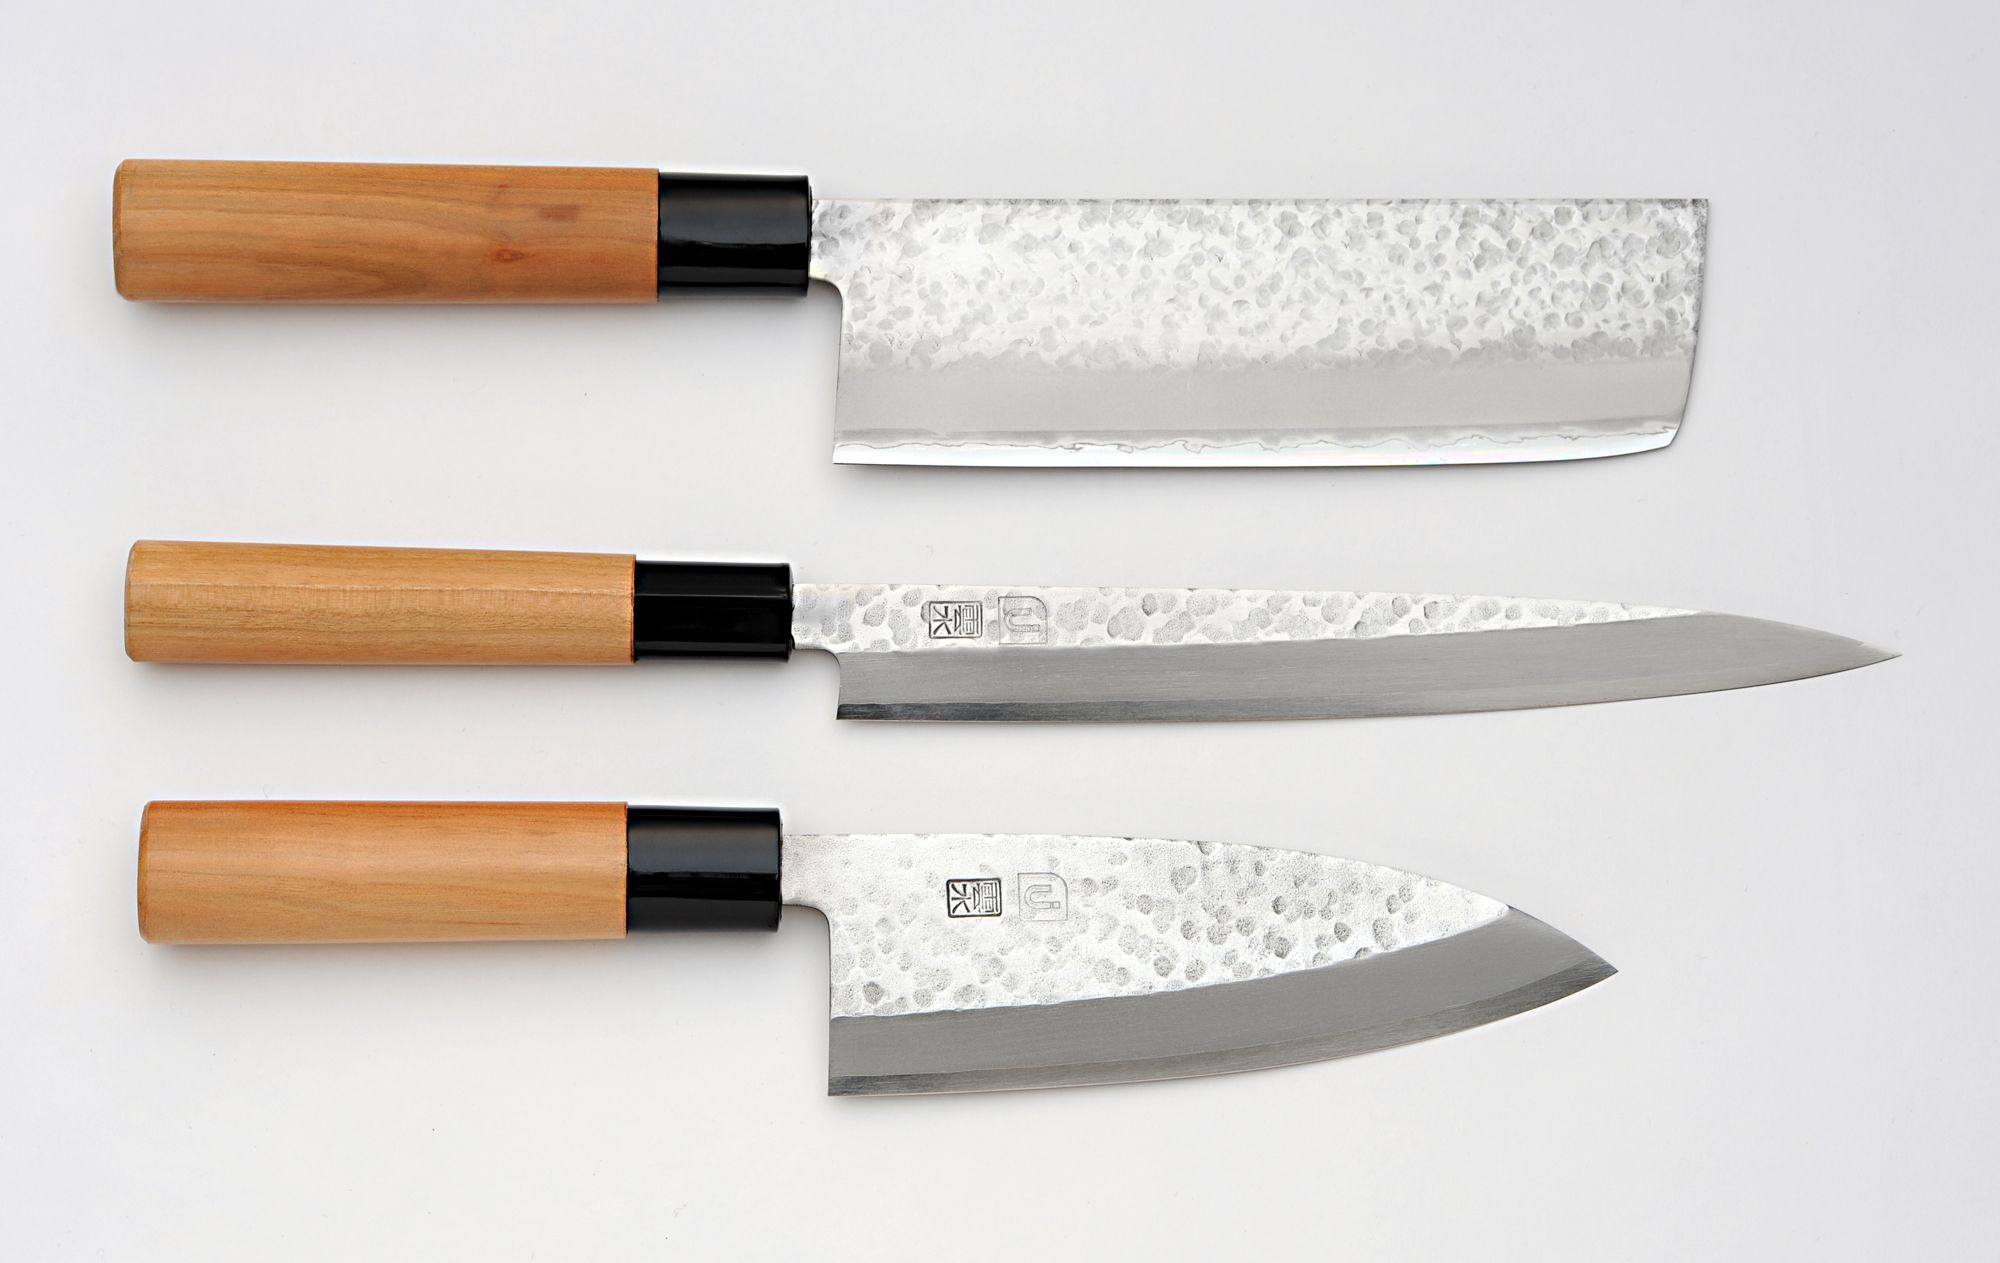 Unsui Japanese Traditional 3 Piece Knife Set Nakiri Yanagi Deba